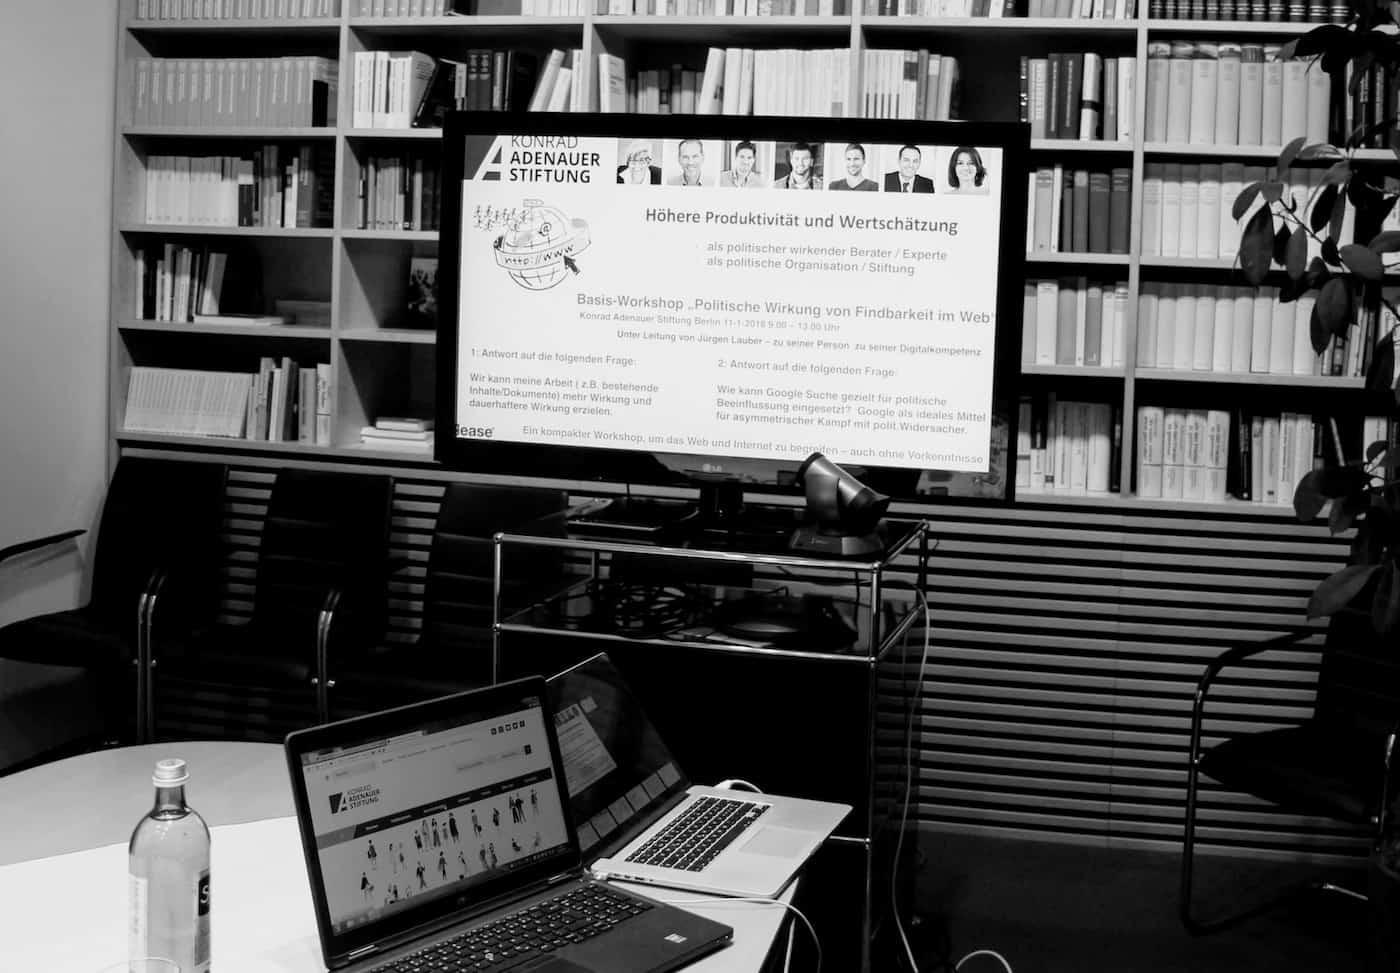 Digitalkompetenz Seminar Januar 2019 Berlin KAS Bildschirm b